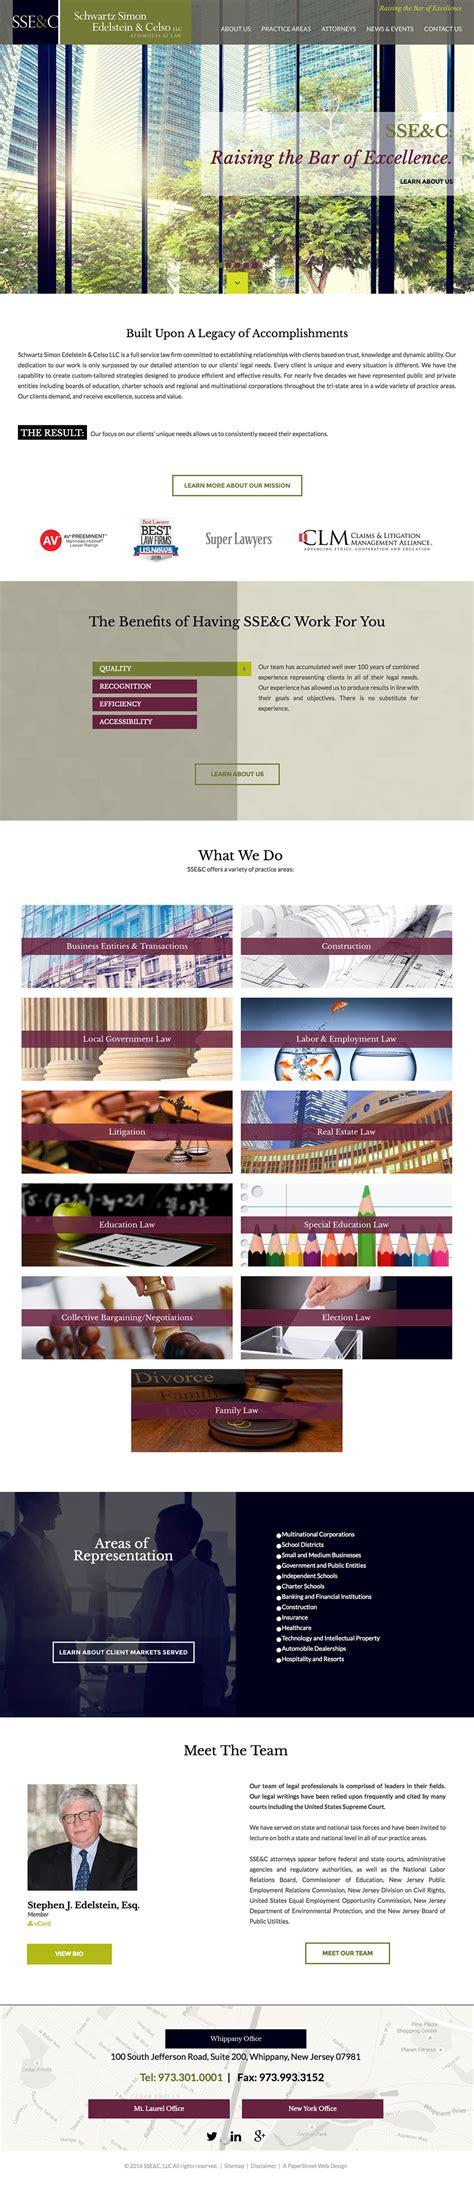 design inspiration web 2016 law firm website design inspiration for 2016 paperstreet